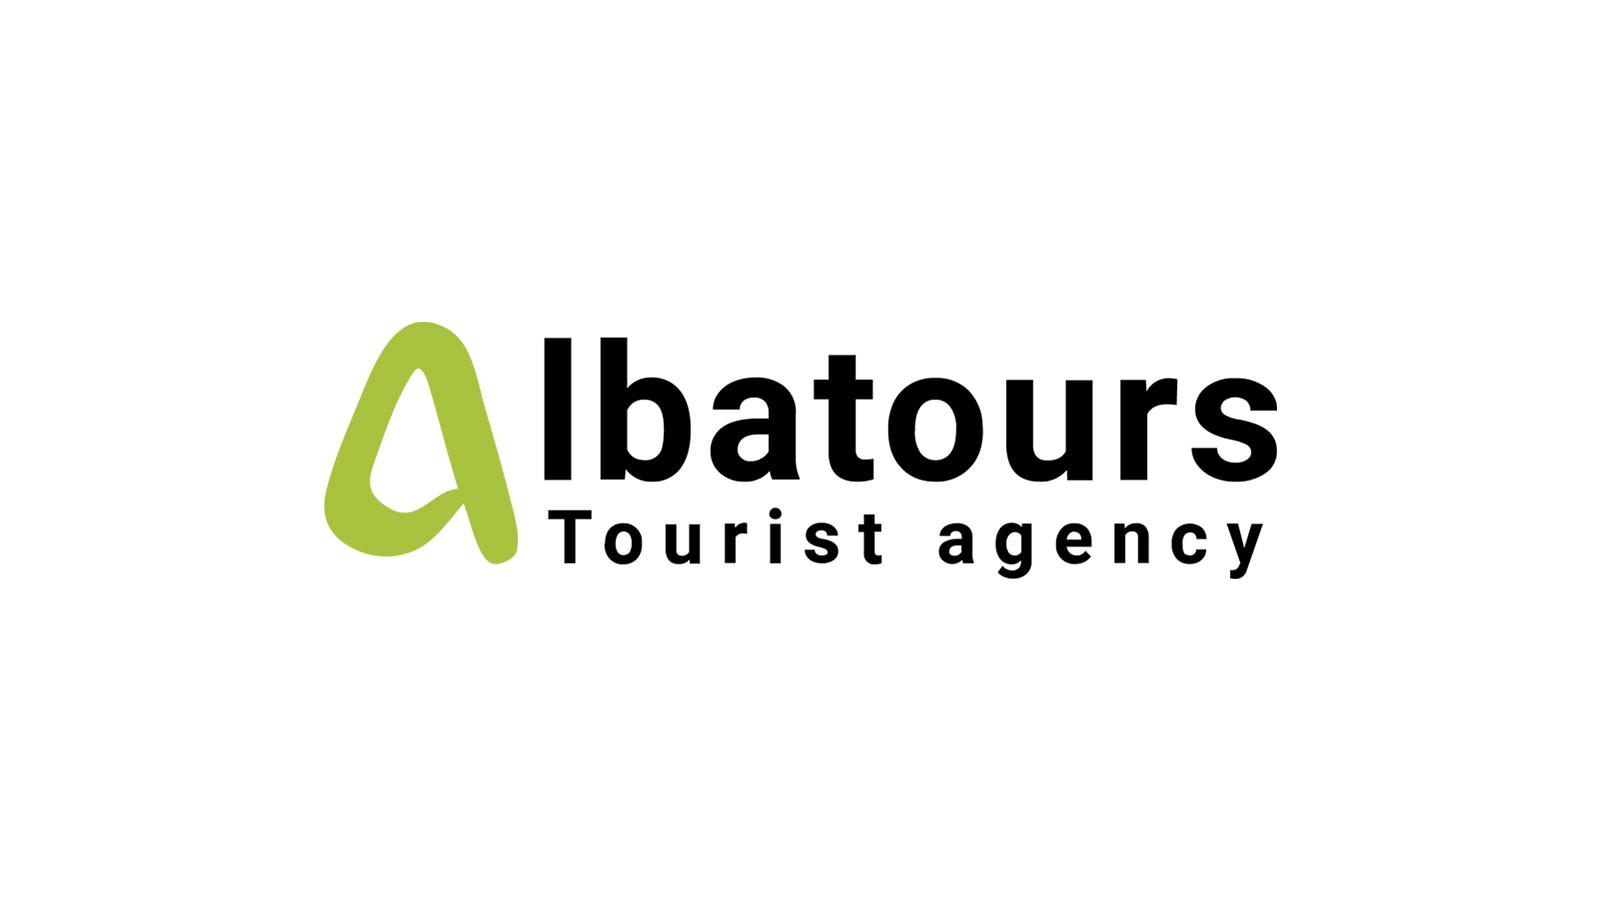 albatours-logo-myrent